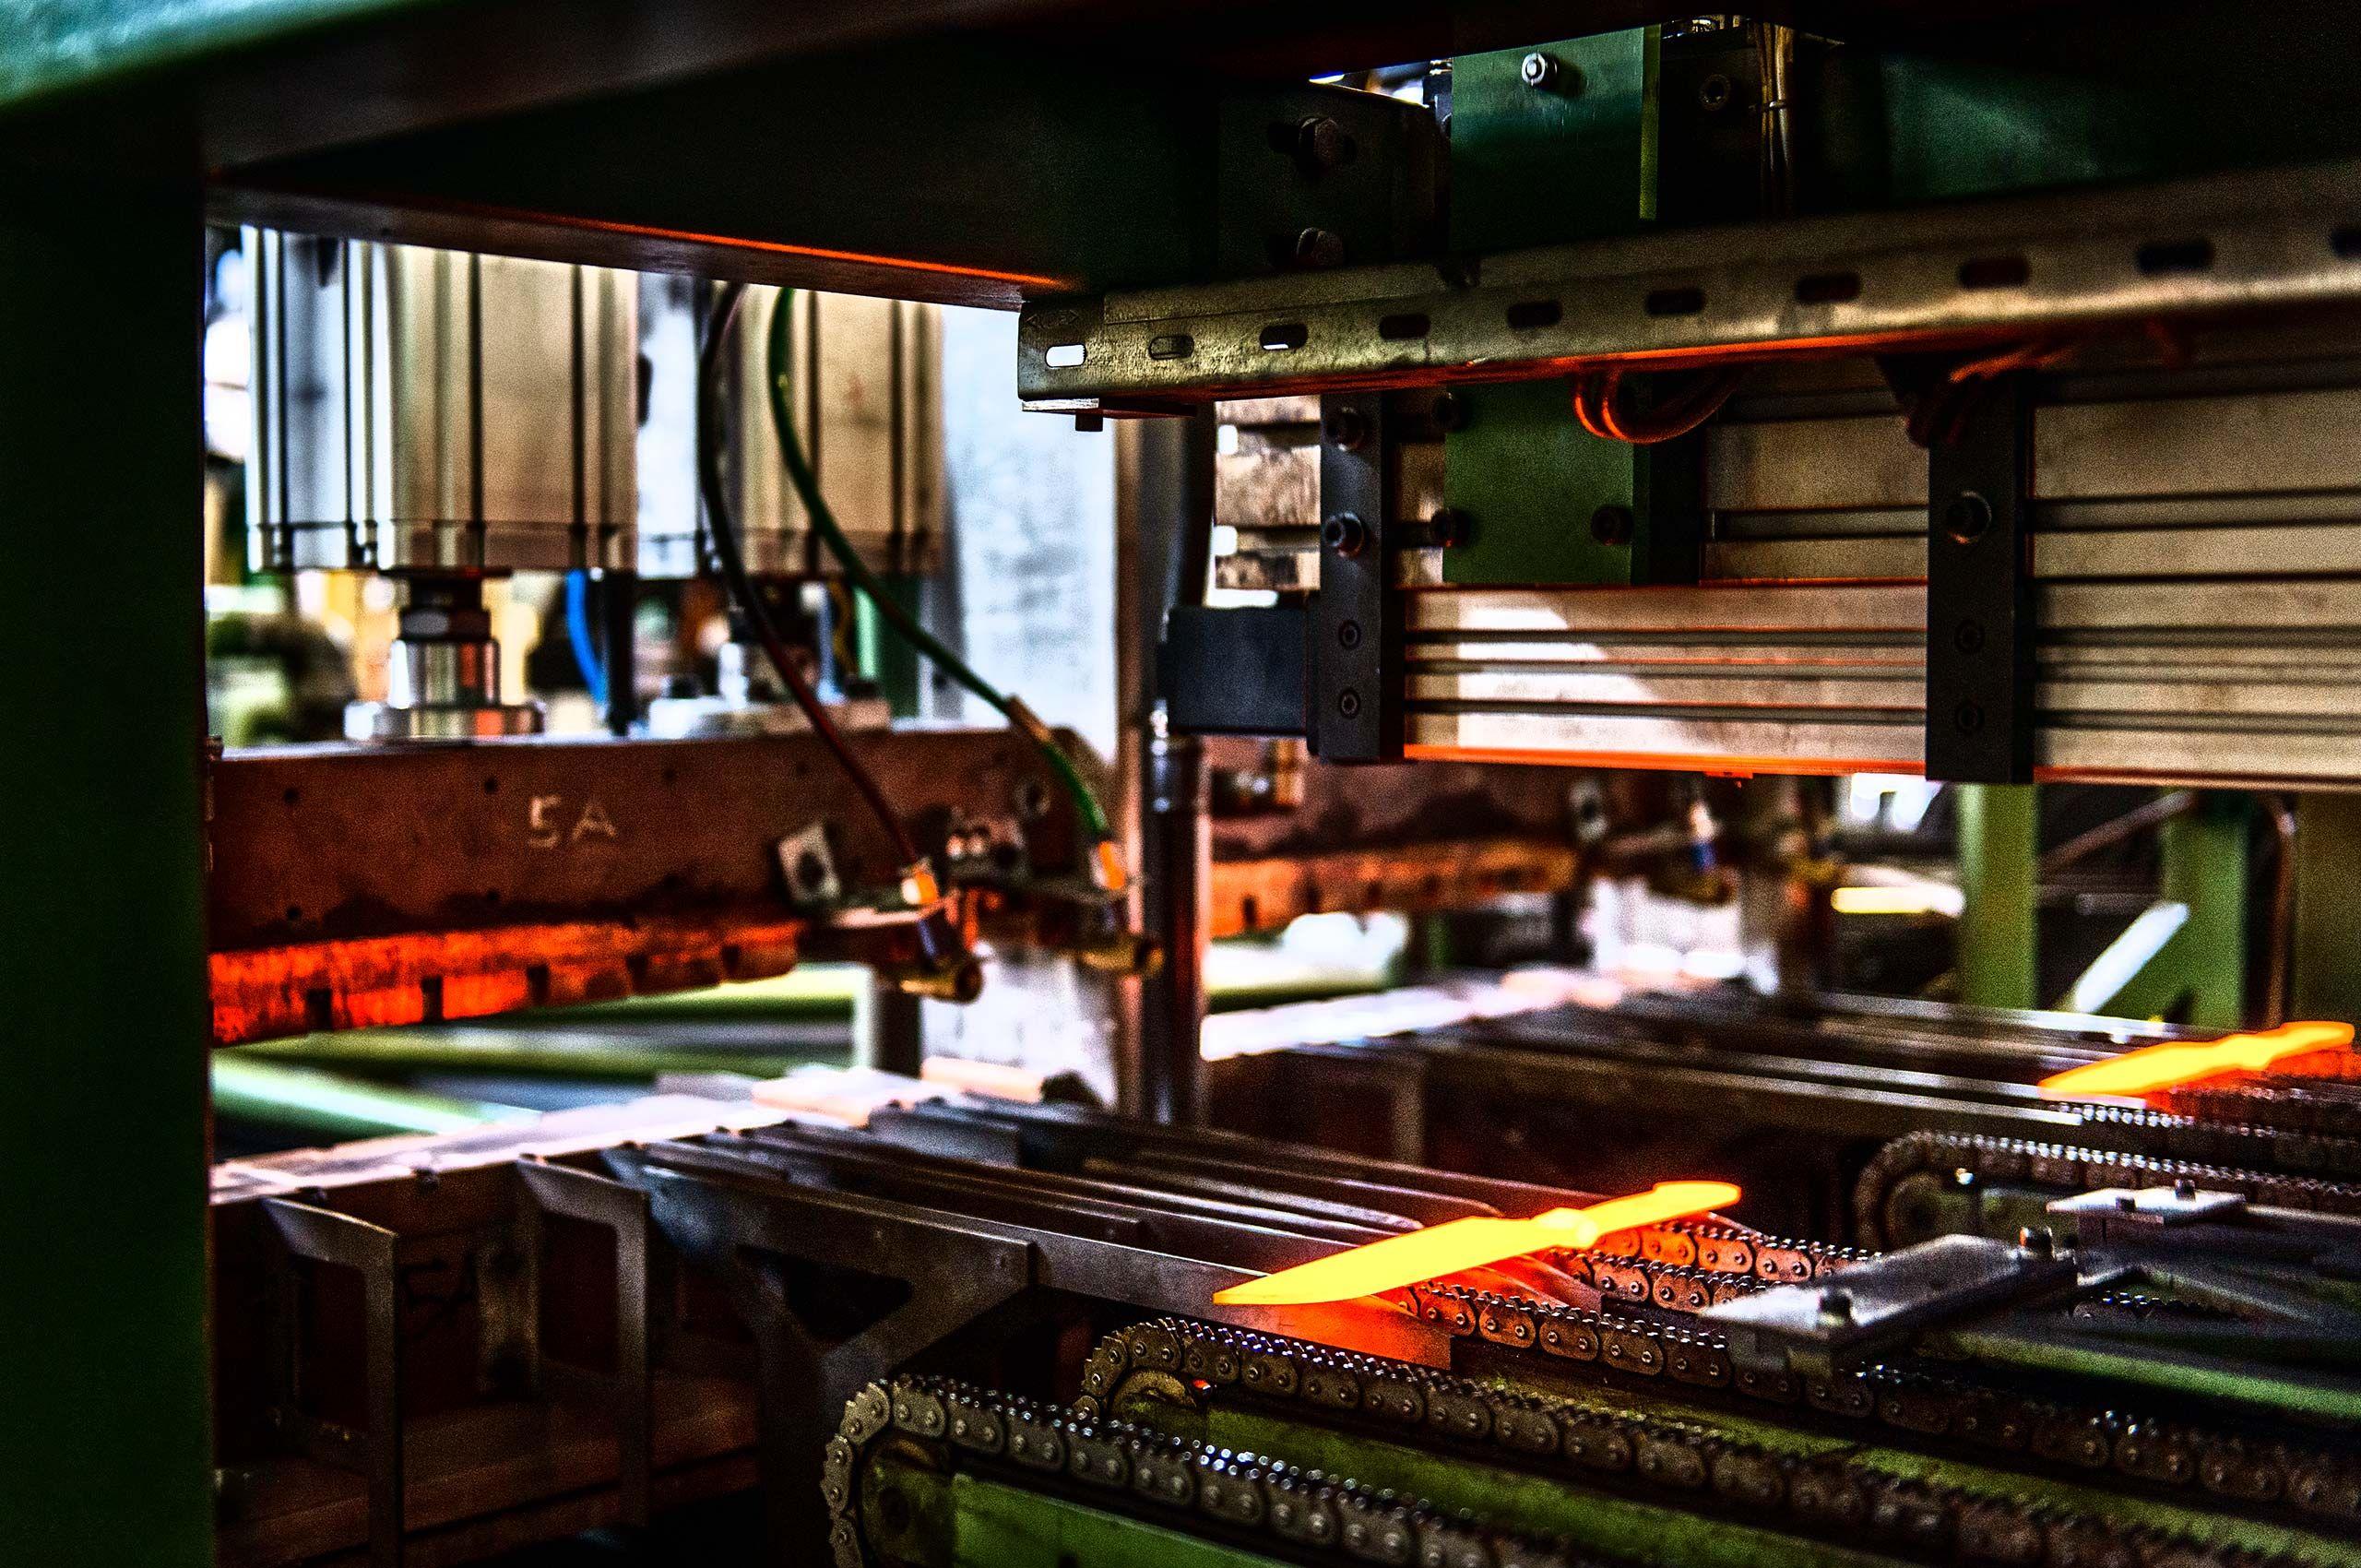 heated-knives-wusthof-factory-HenrikOlundPhotography.jpg